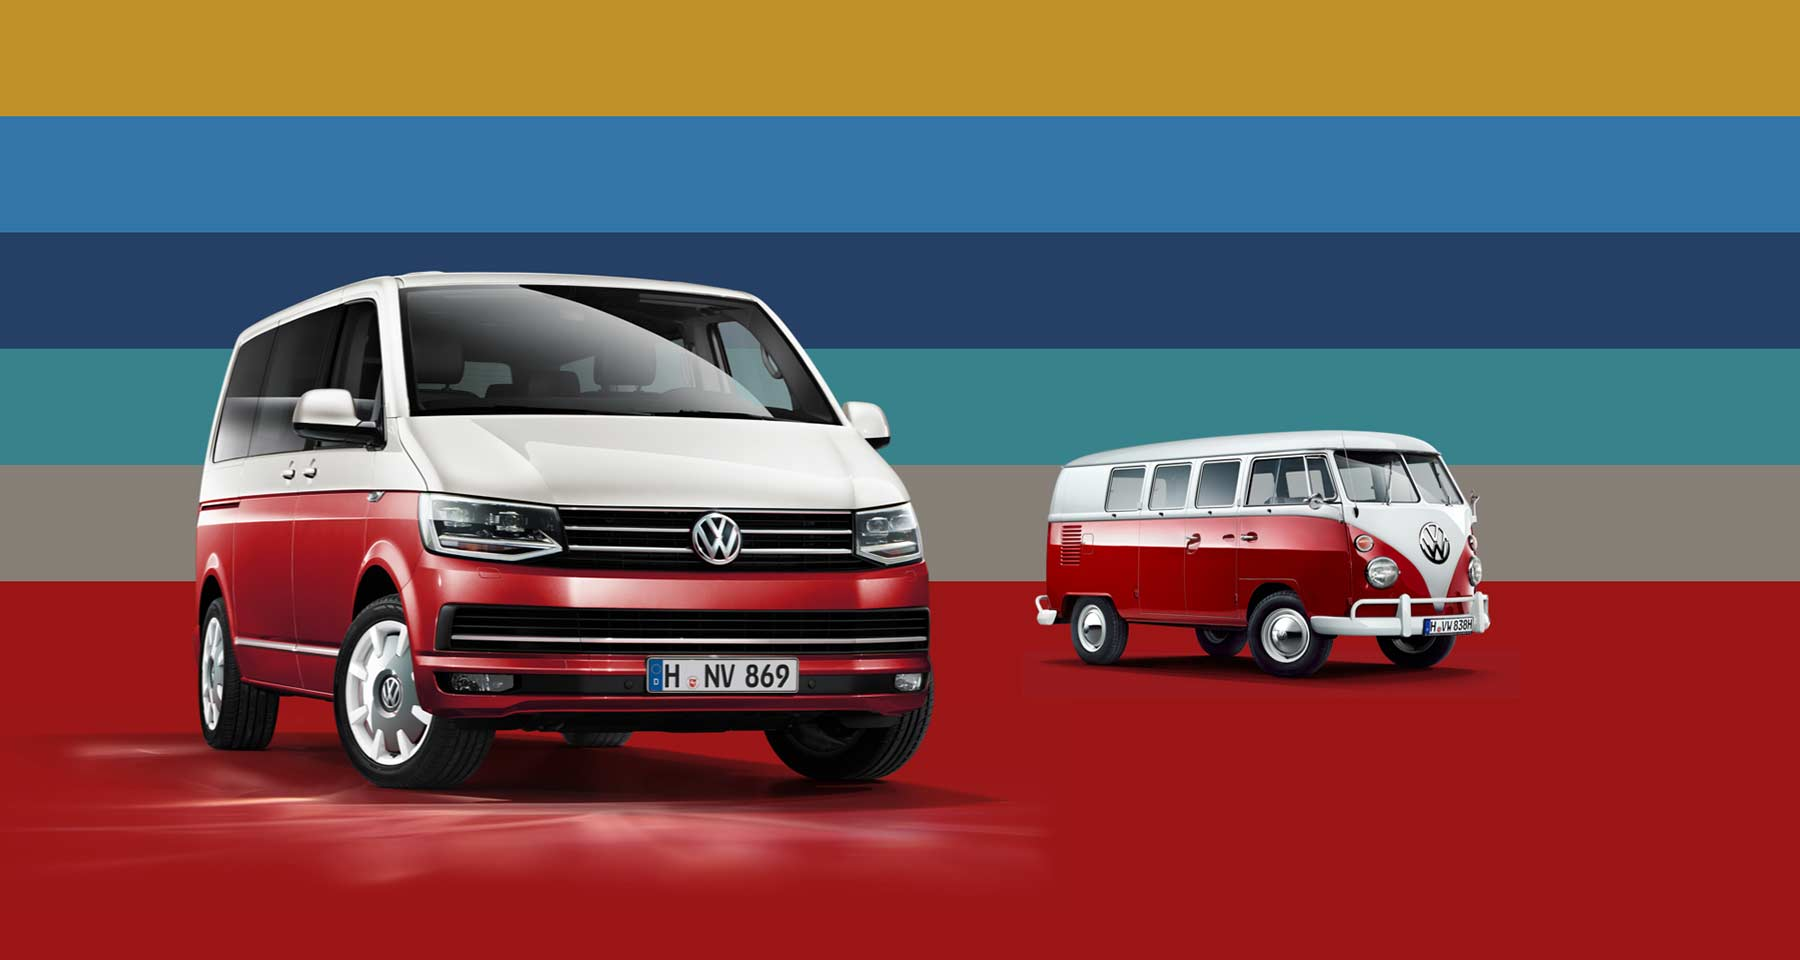 70 Jahre VW Bulli! 70-jahre-vw-bulli_01